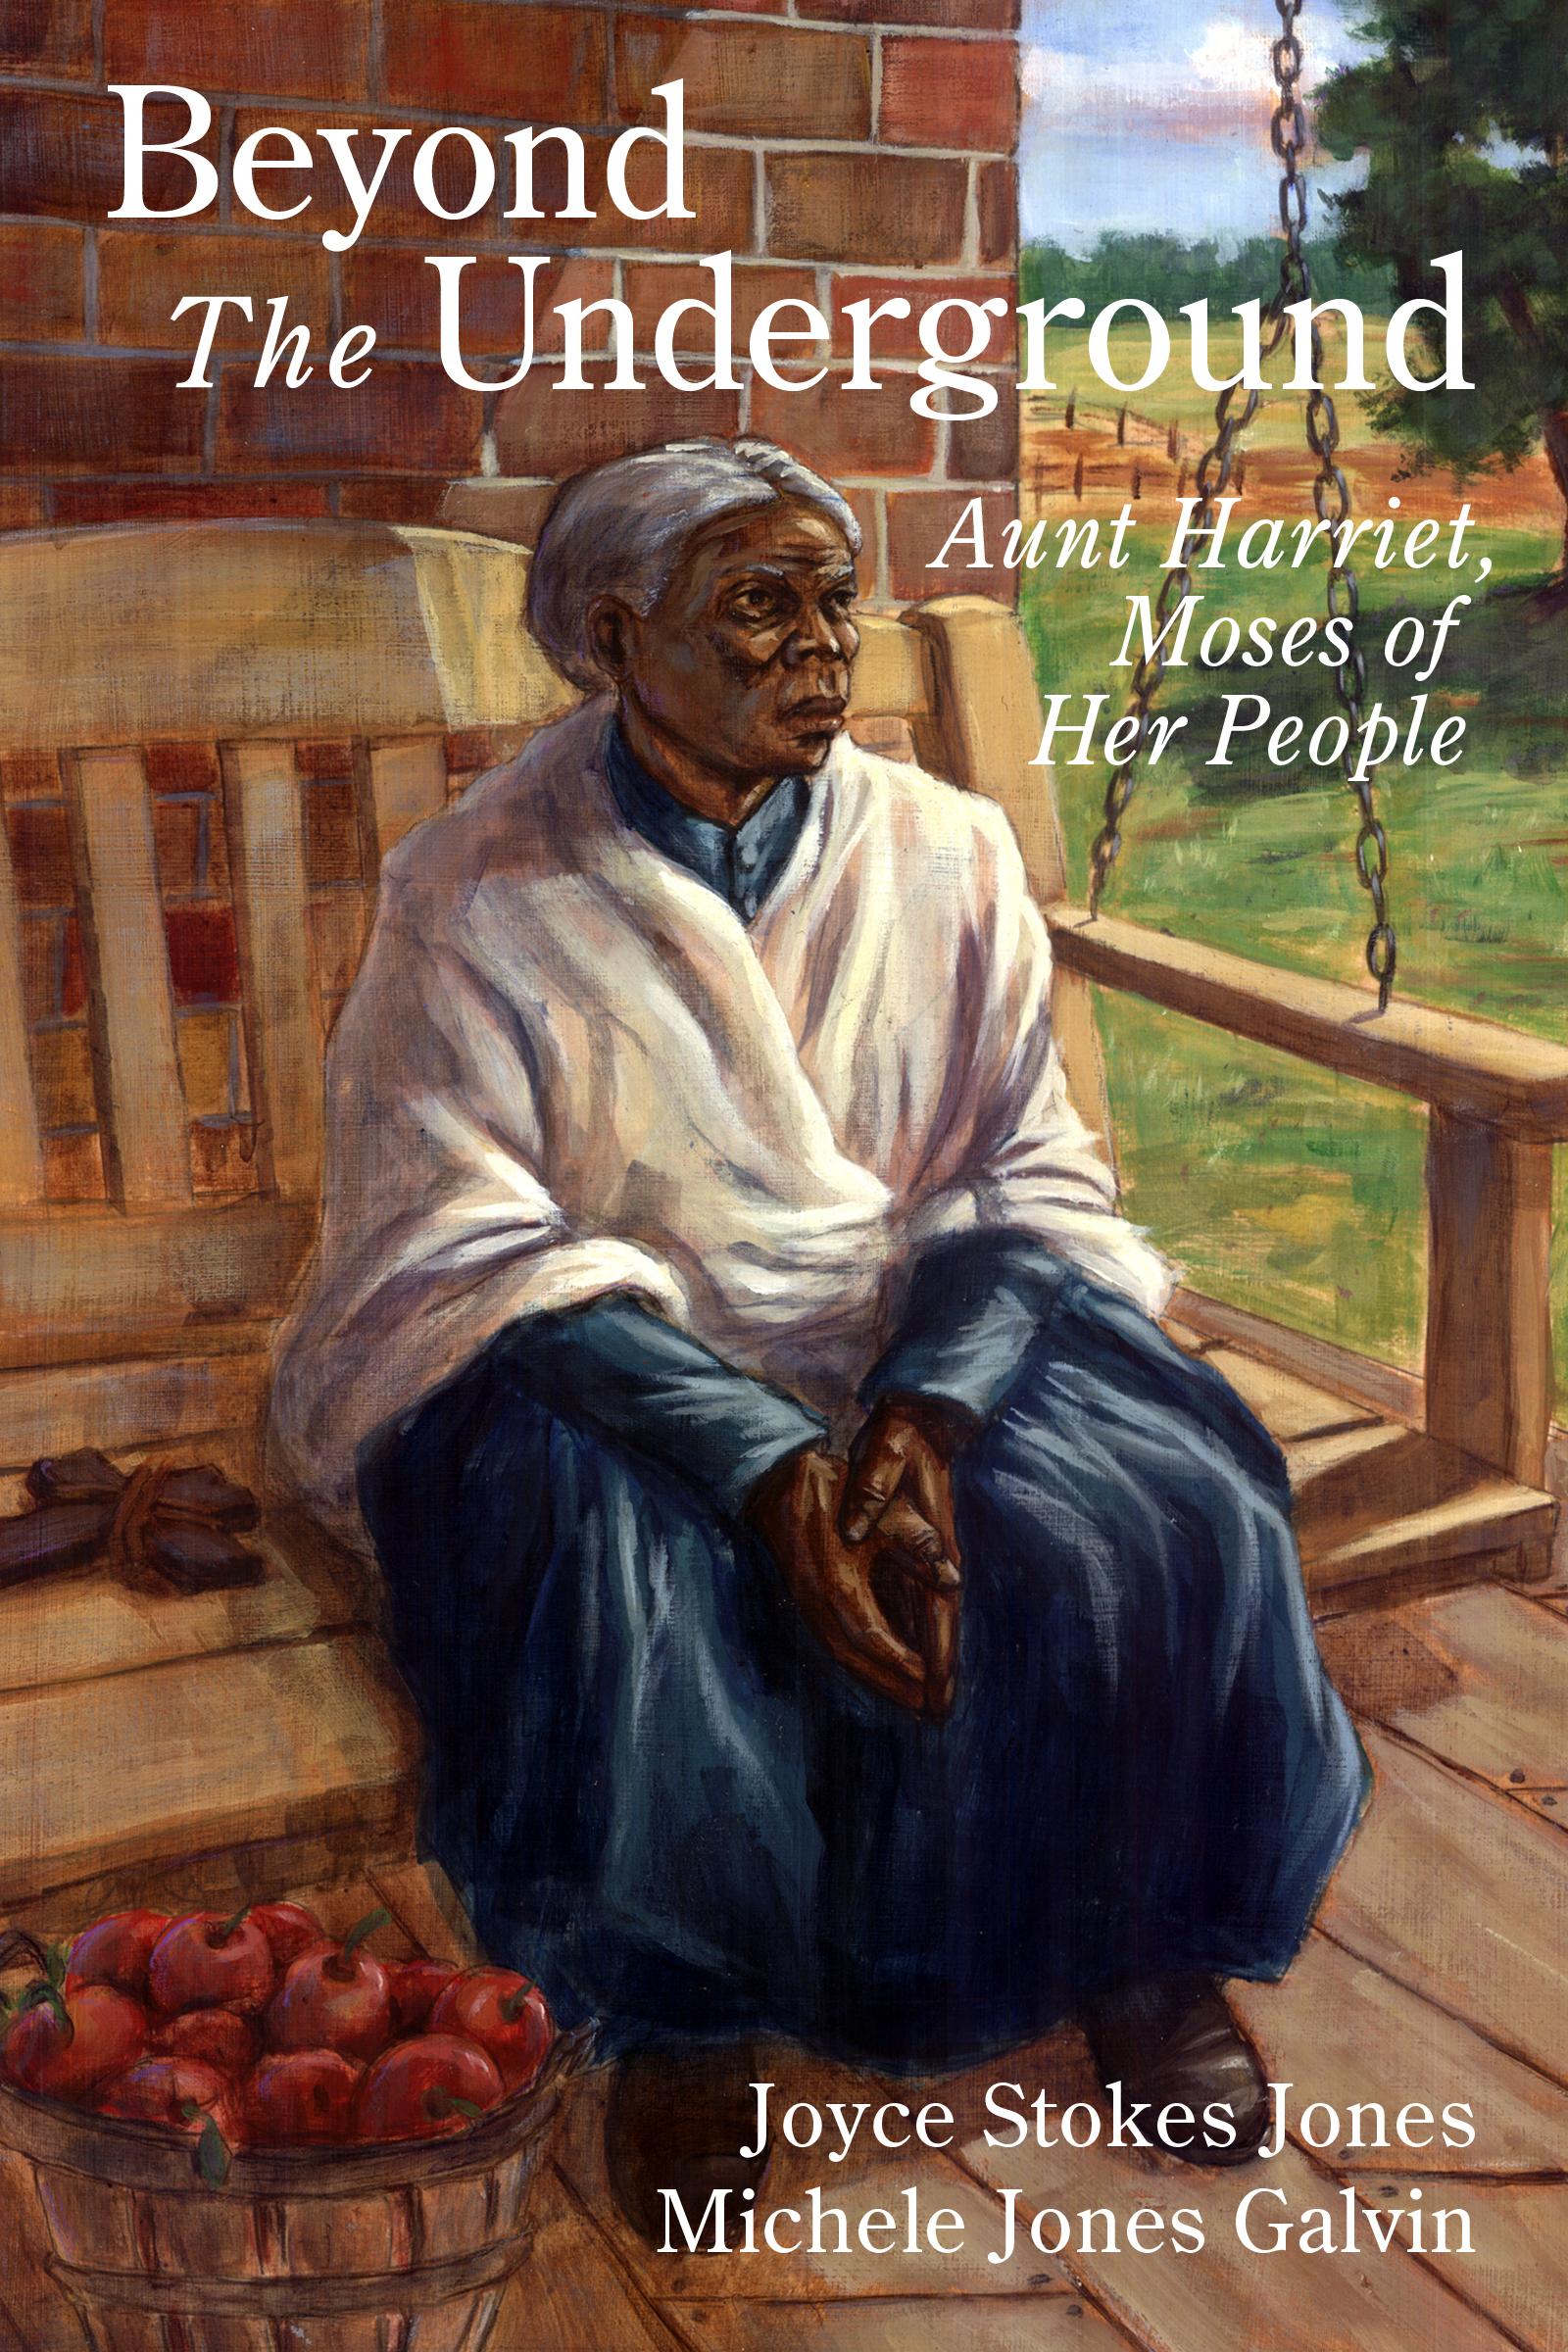 Beyond the Underground: Aunt Harriet, Moses of Her People Joyce Stokes Jones